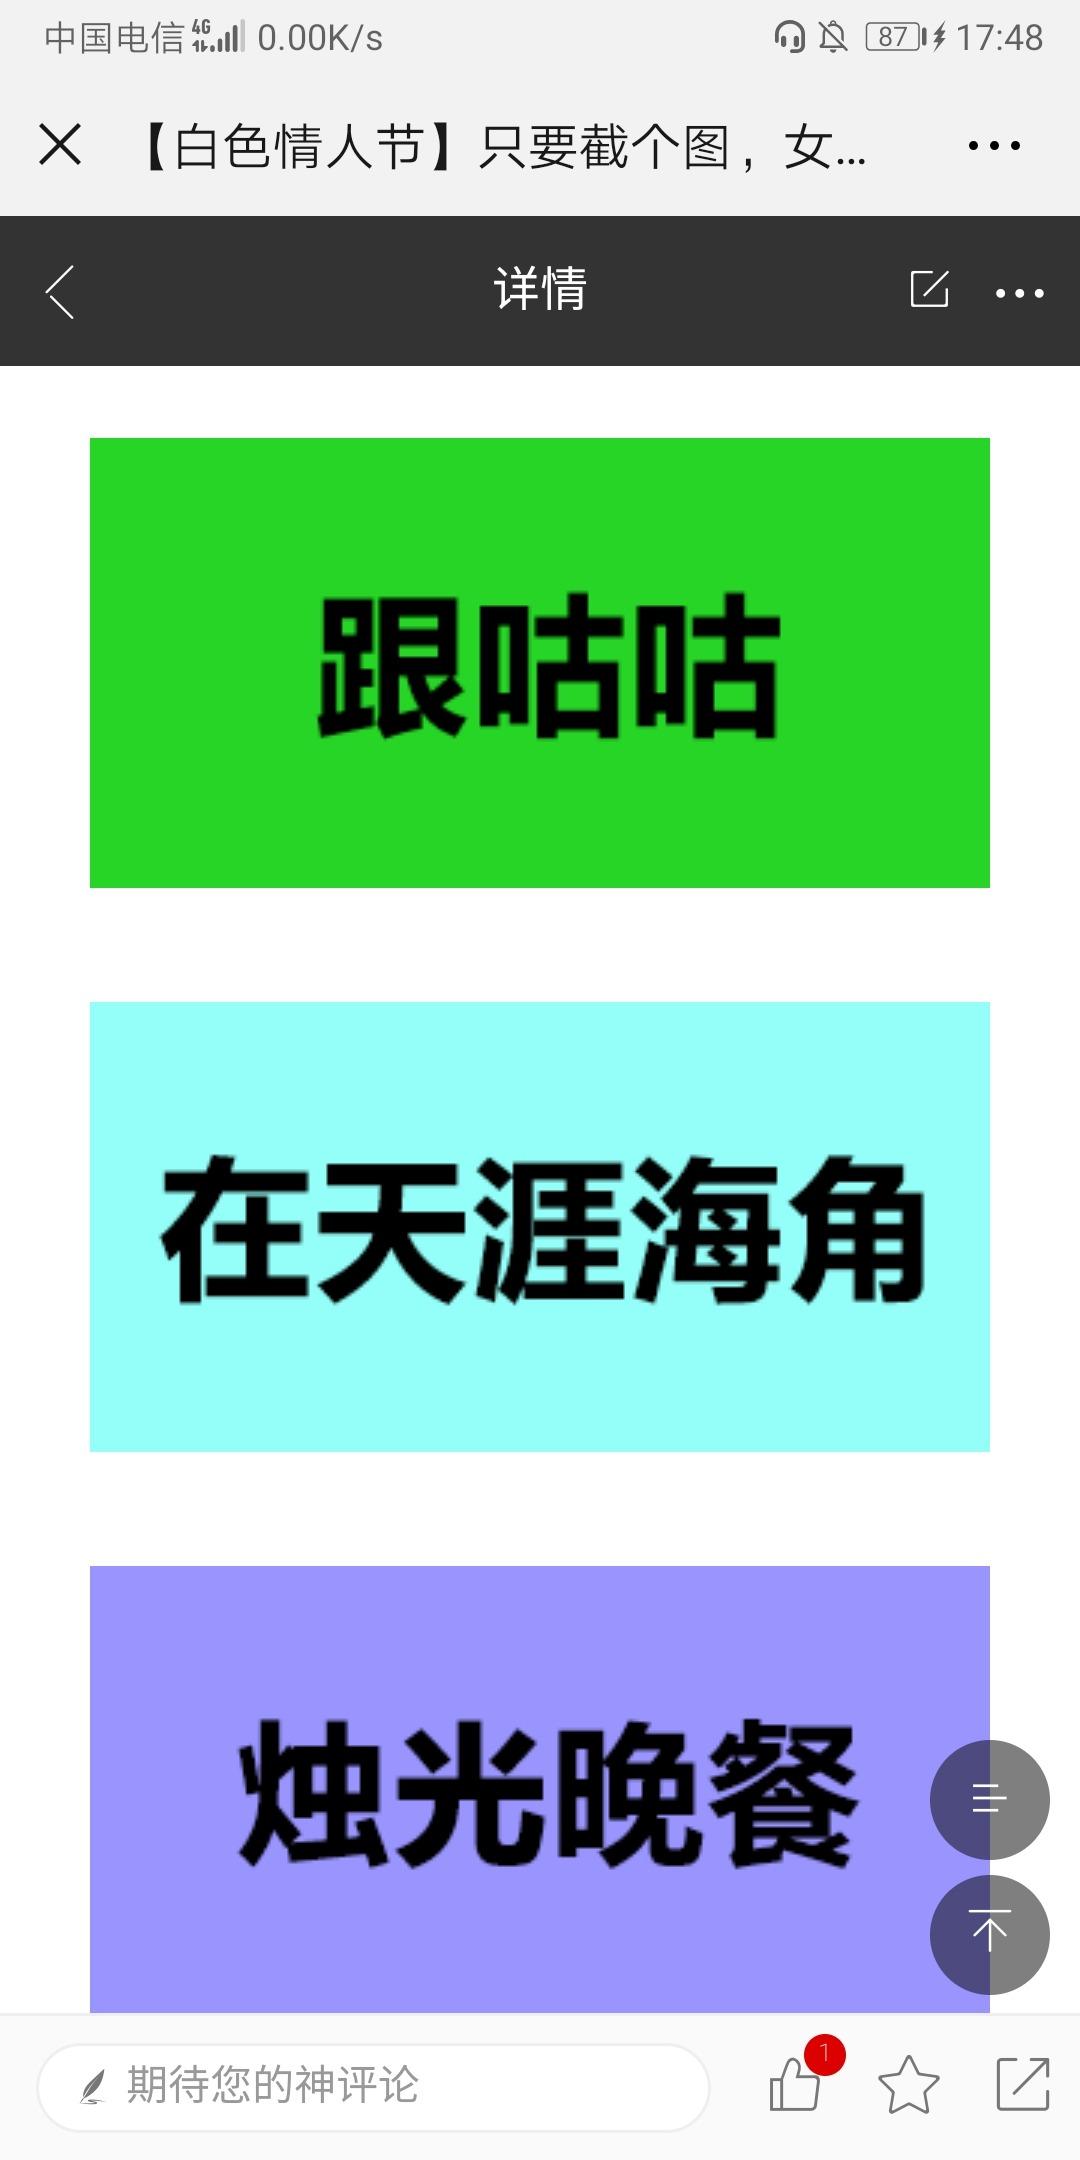 Screenshot_20190313_174833_com.tencent.mm.jpg